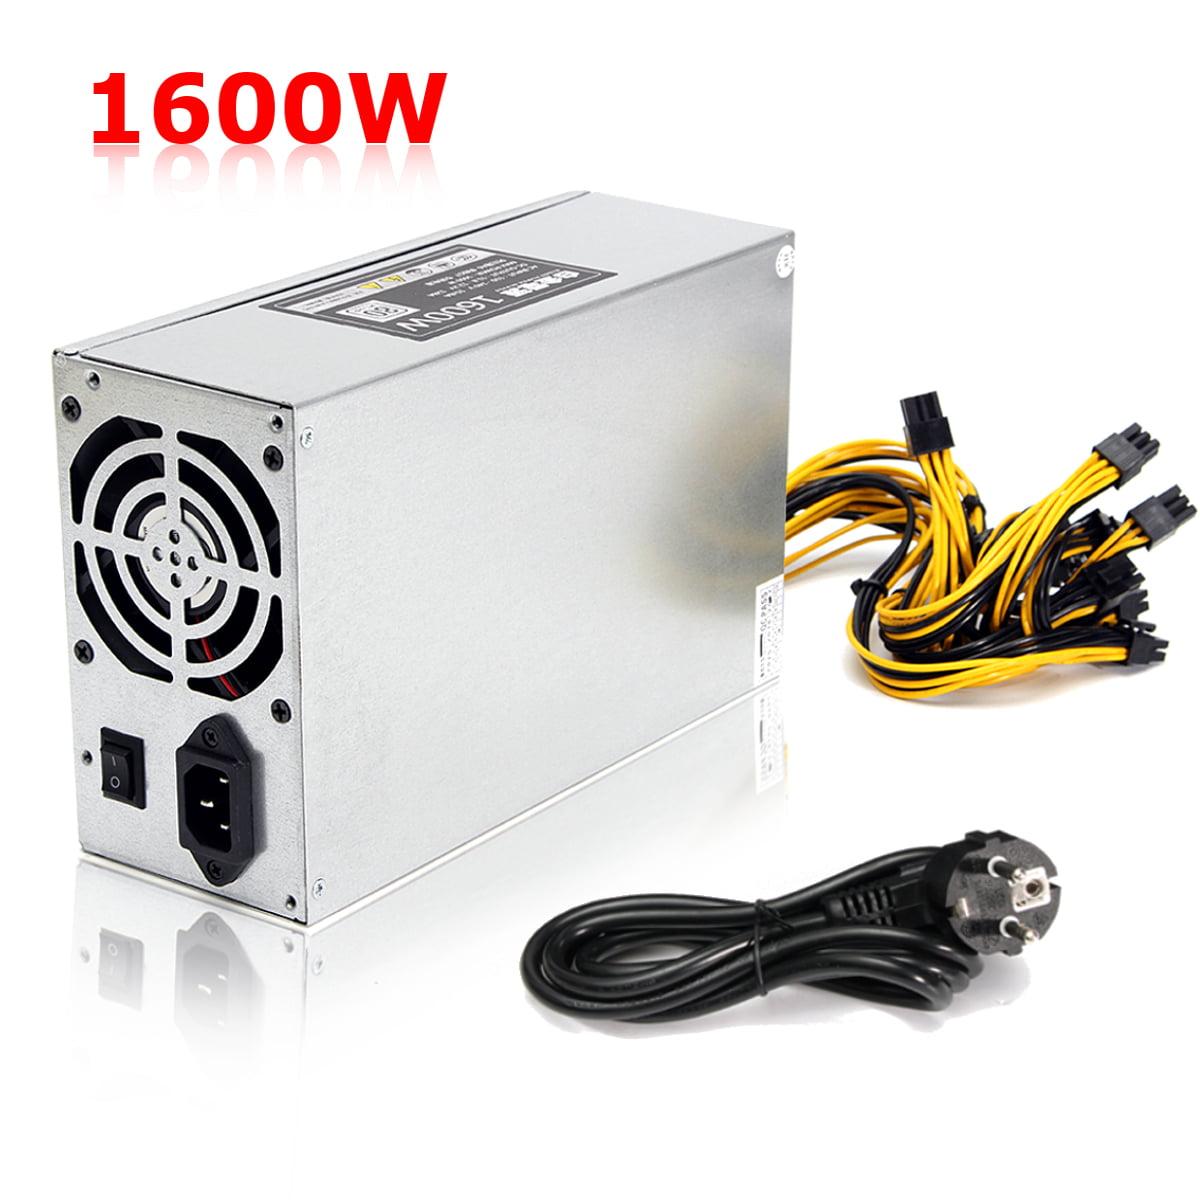 Bitcoin Miner Mining Power Supply Machine For 6 GPU bitcoin miner ETH BTC Rig S7 S9 1600W